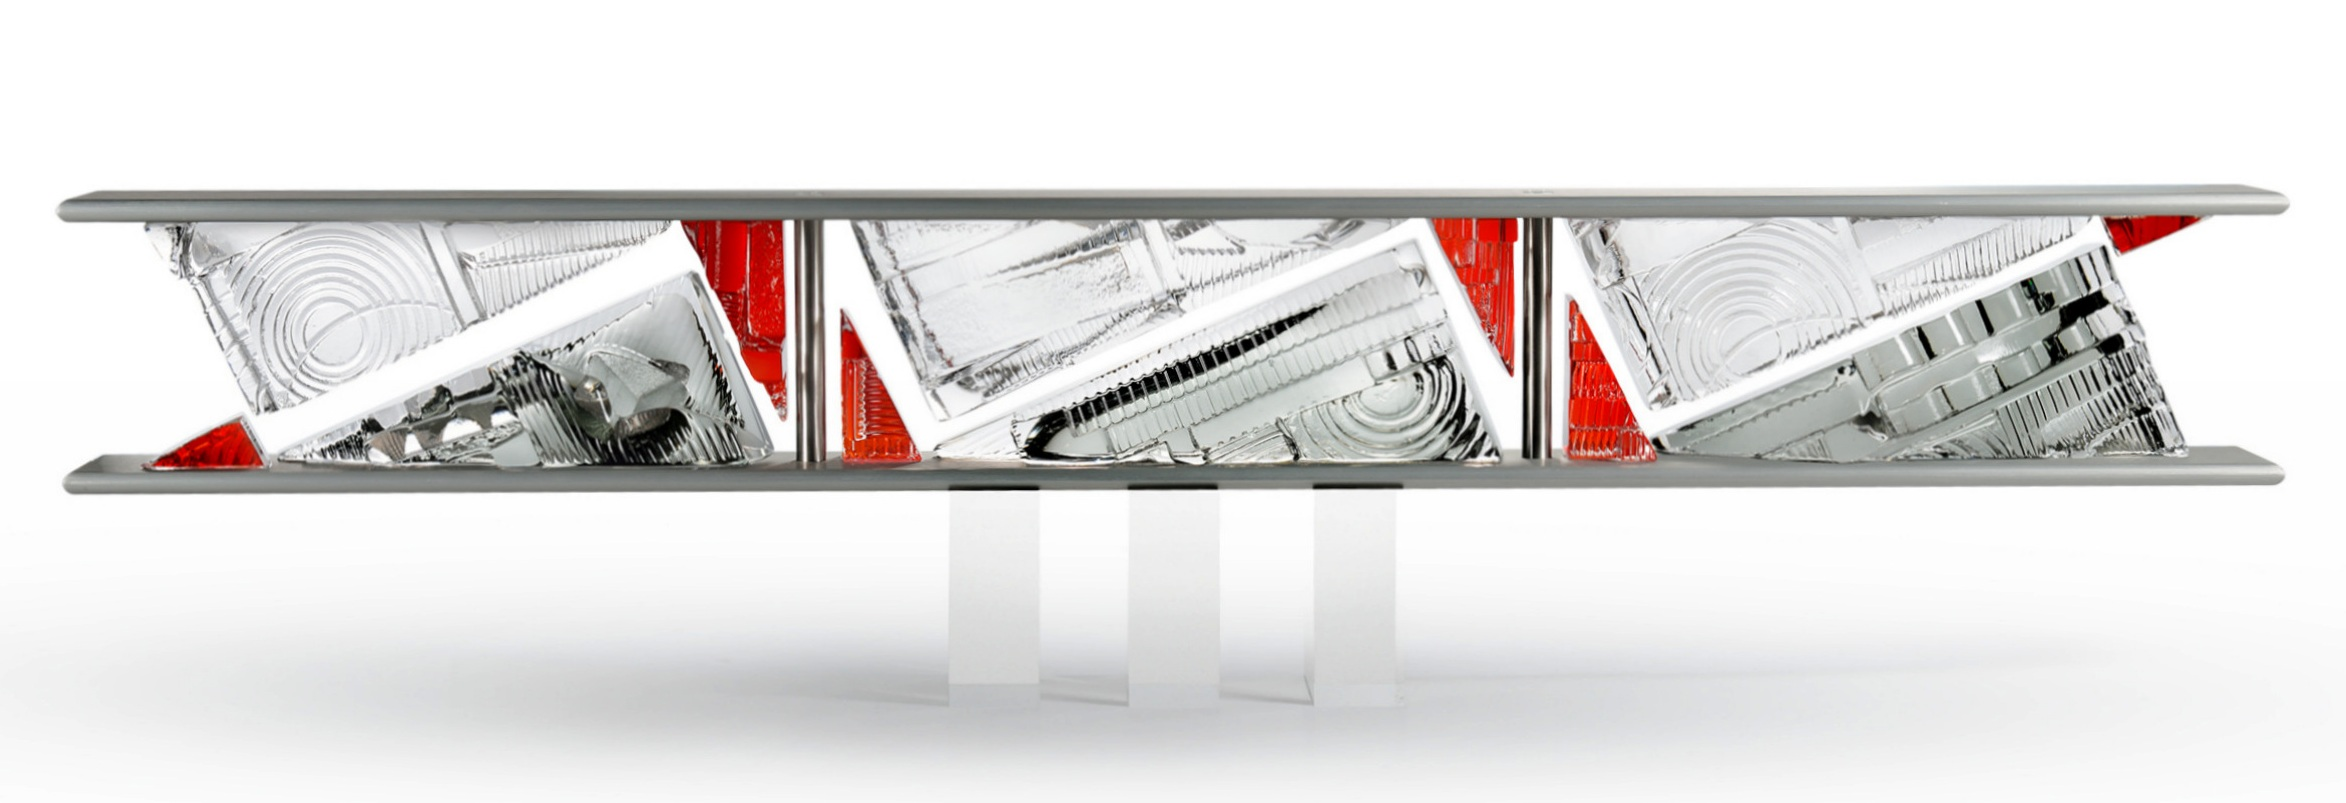 RAZZLE DAZZLE II,  36 x 3 x 4.75 inches,   $4800